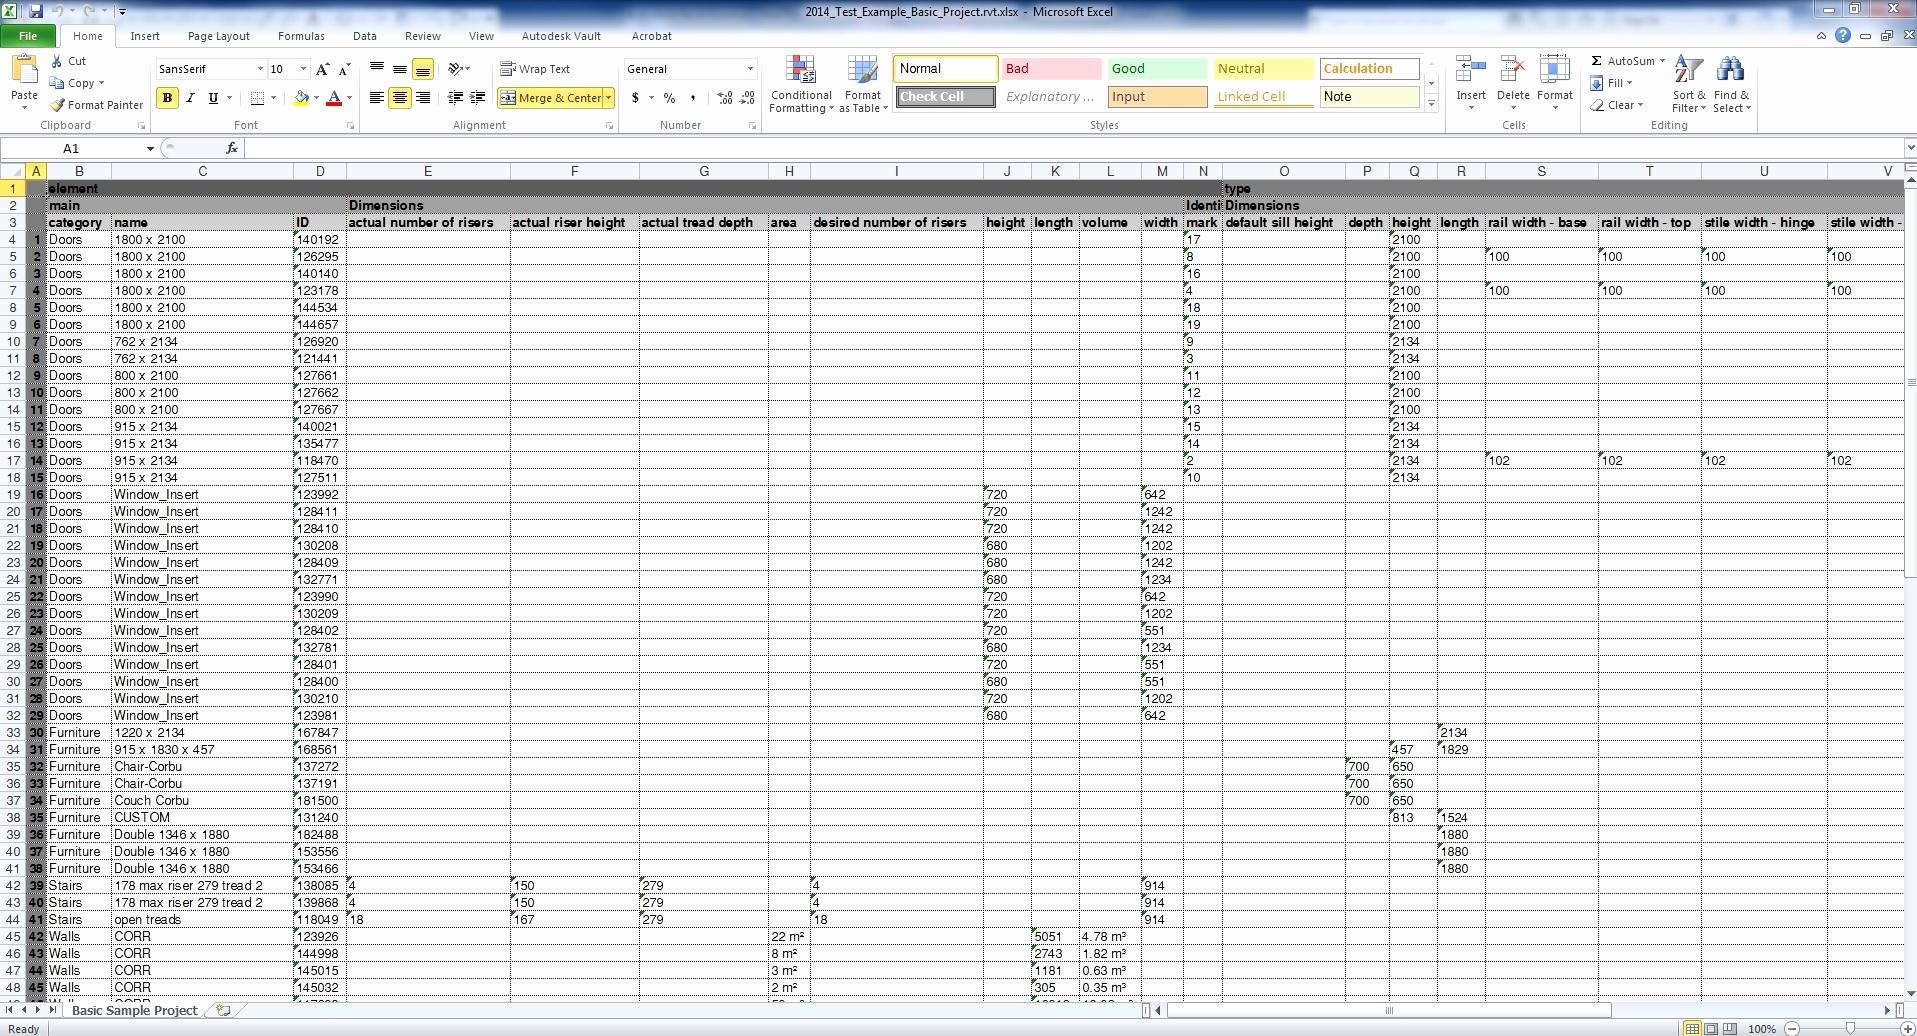 Auto Restoration Spreadsheet Inside Car Restoration Cost Spreadsheet Sheet Construction Estimating Auto Restoration Spreadsheet Printable Spreadshee Printable Spreadshee auto restoration spreadsheet